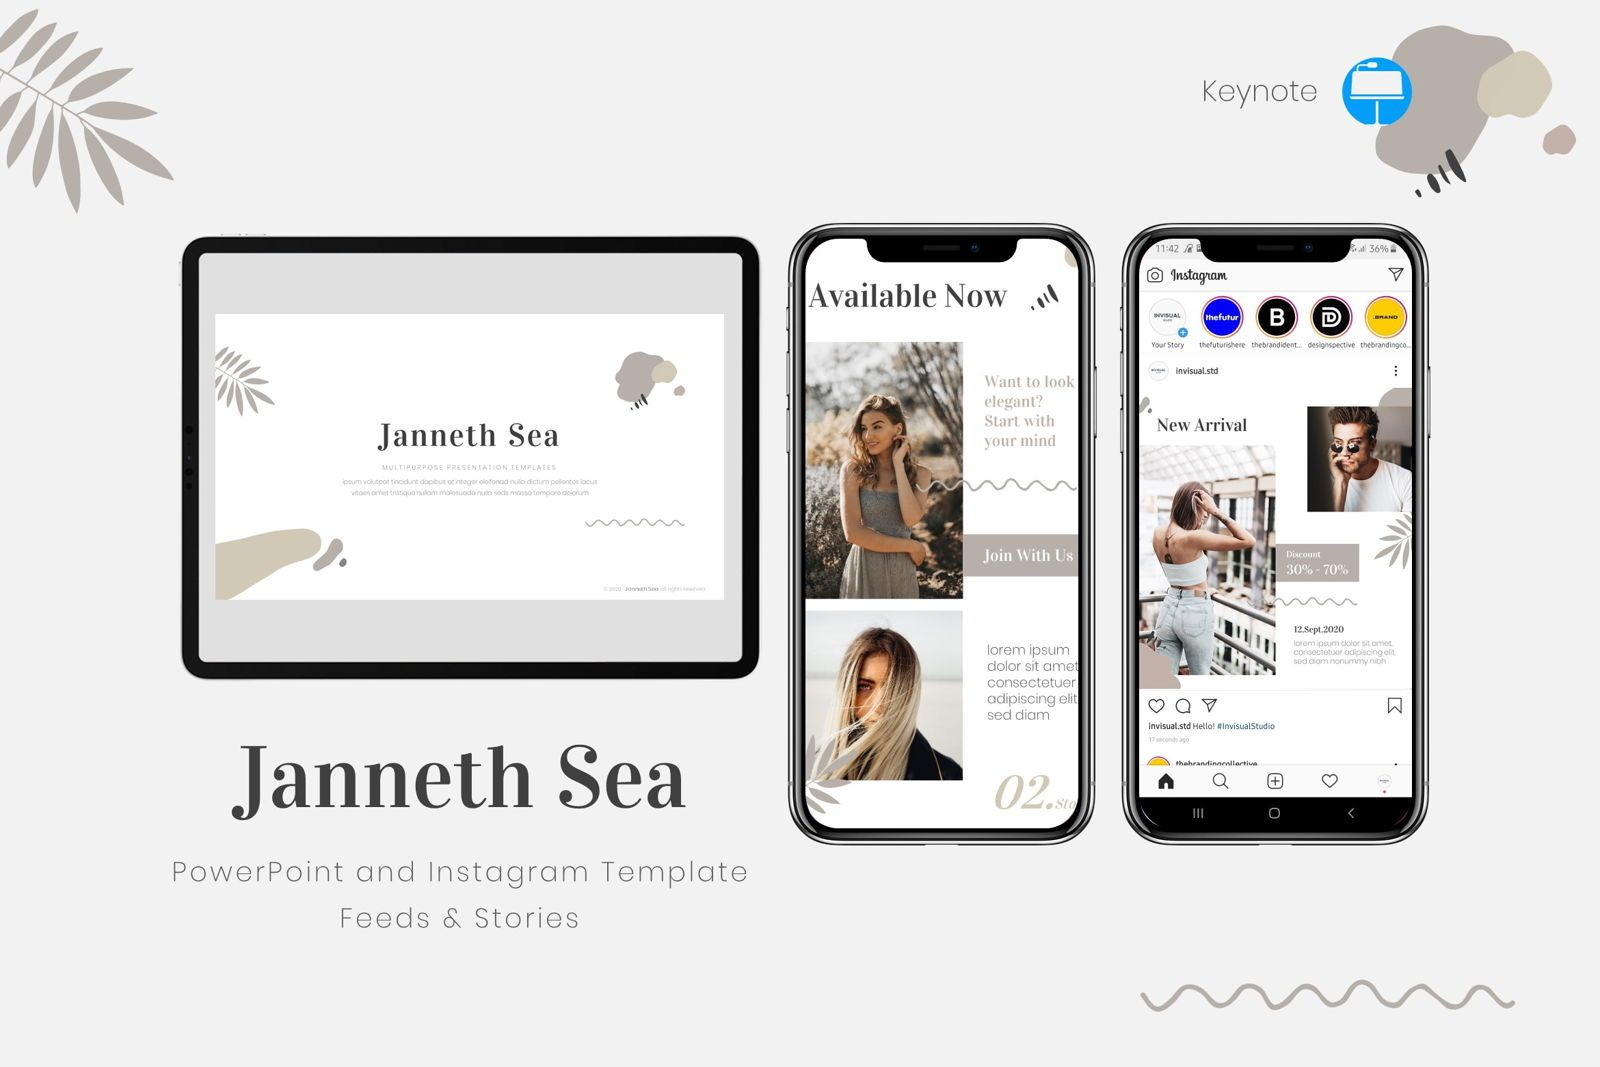 Janneth Sea - Keynote Template, 08021, Presentation Templates — PoweredTemplate.com